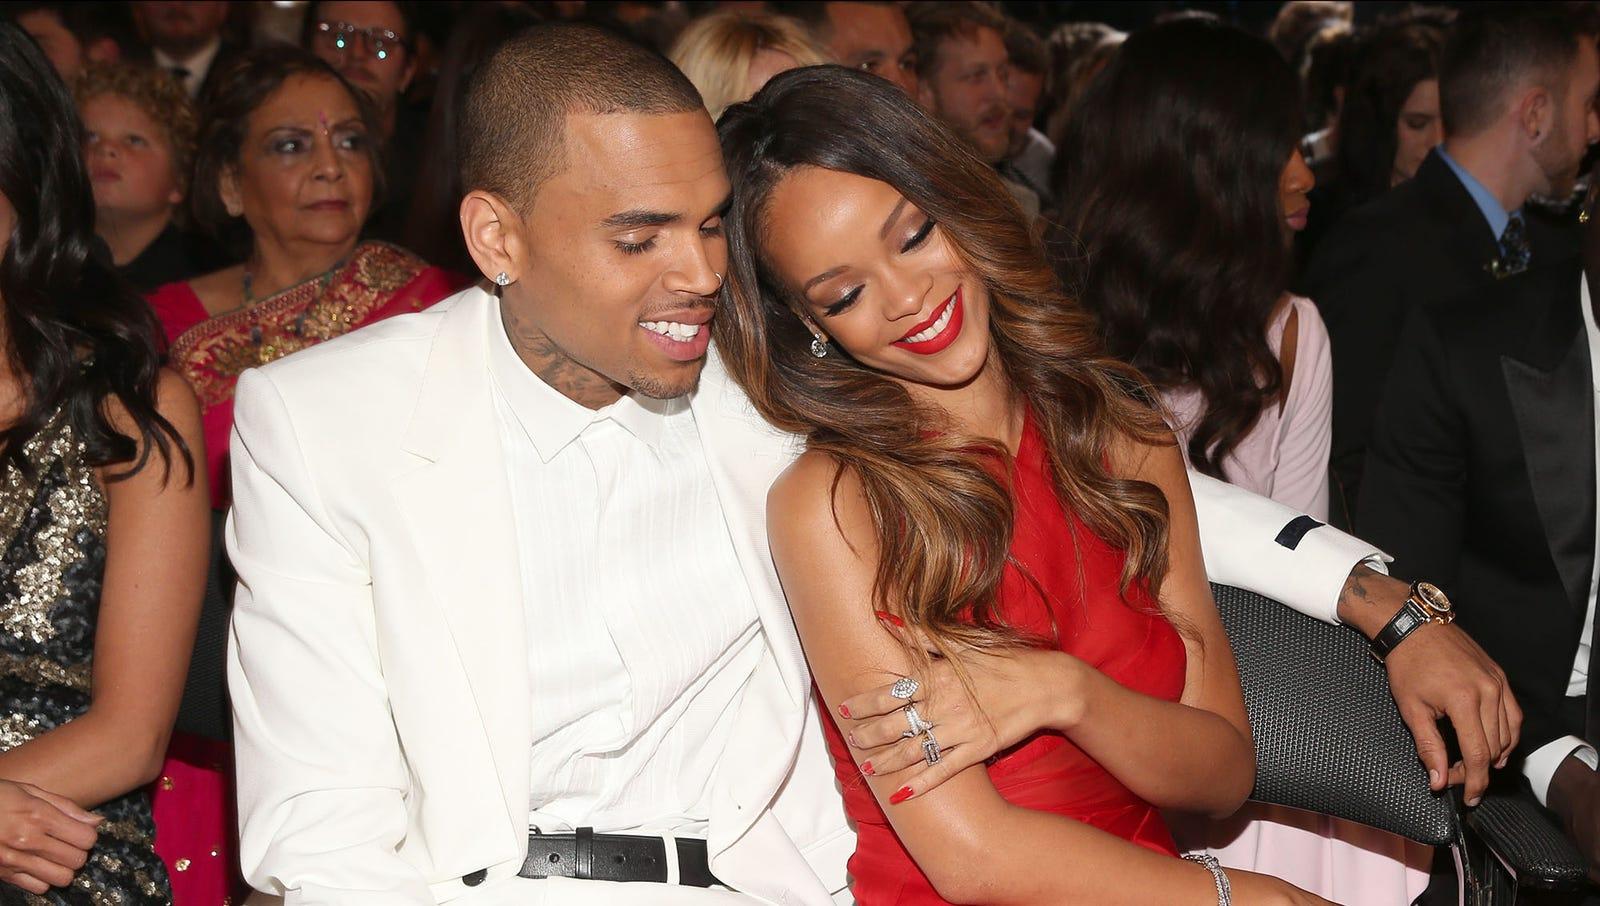 Heartbroken Chris Brown Always Thought Rihanna Was Woman He'd Beat To Death